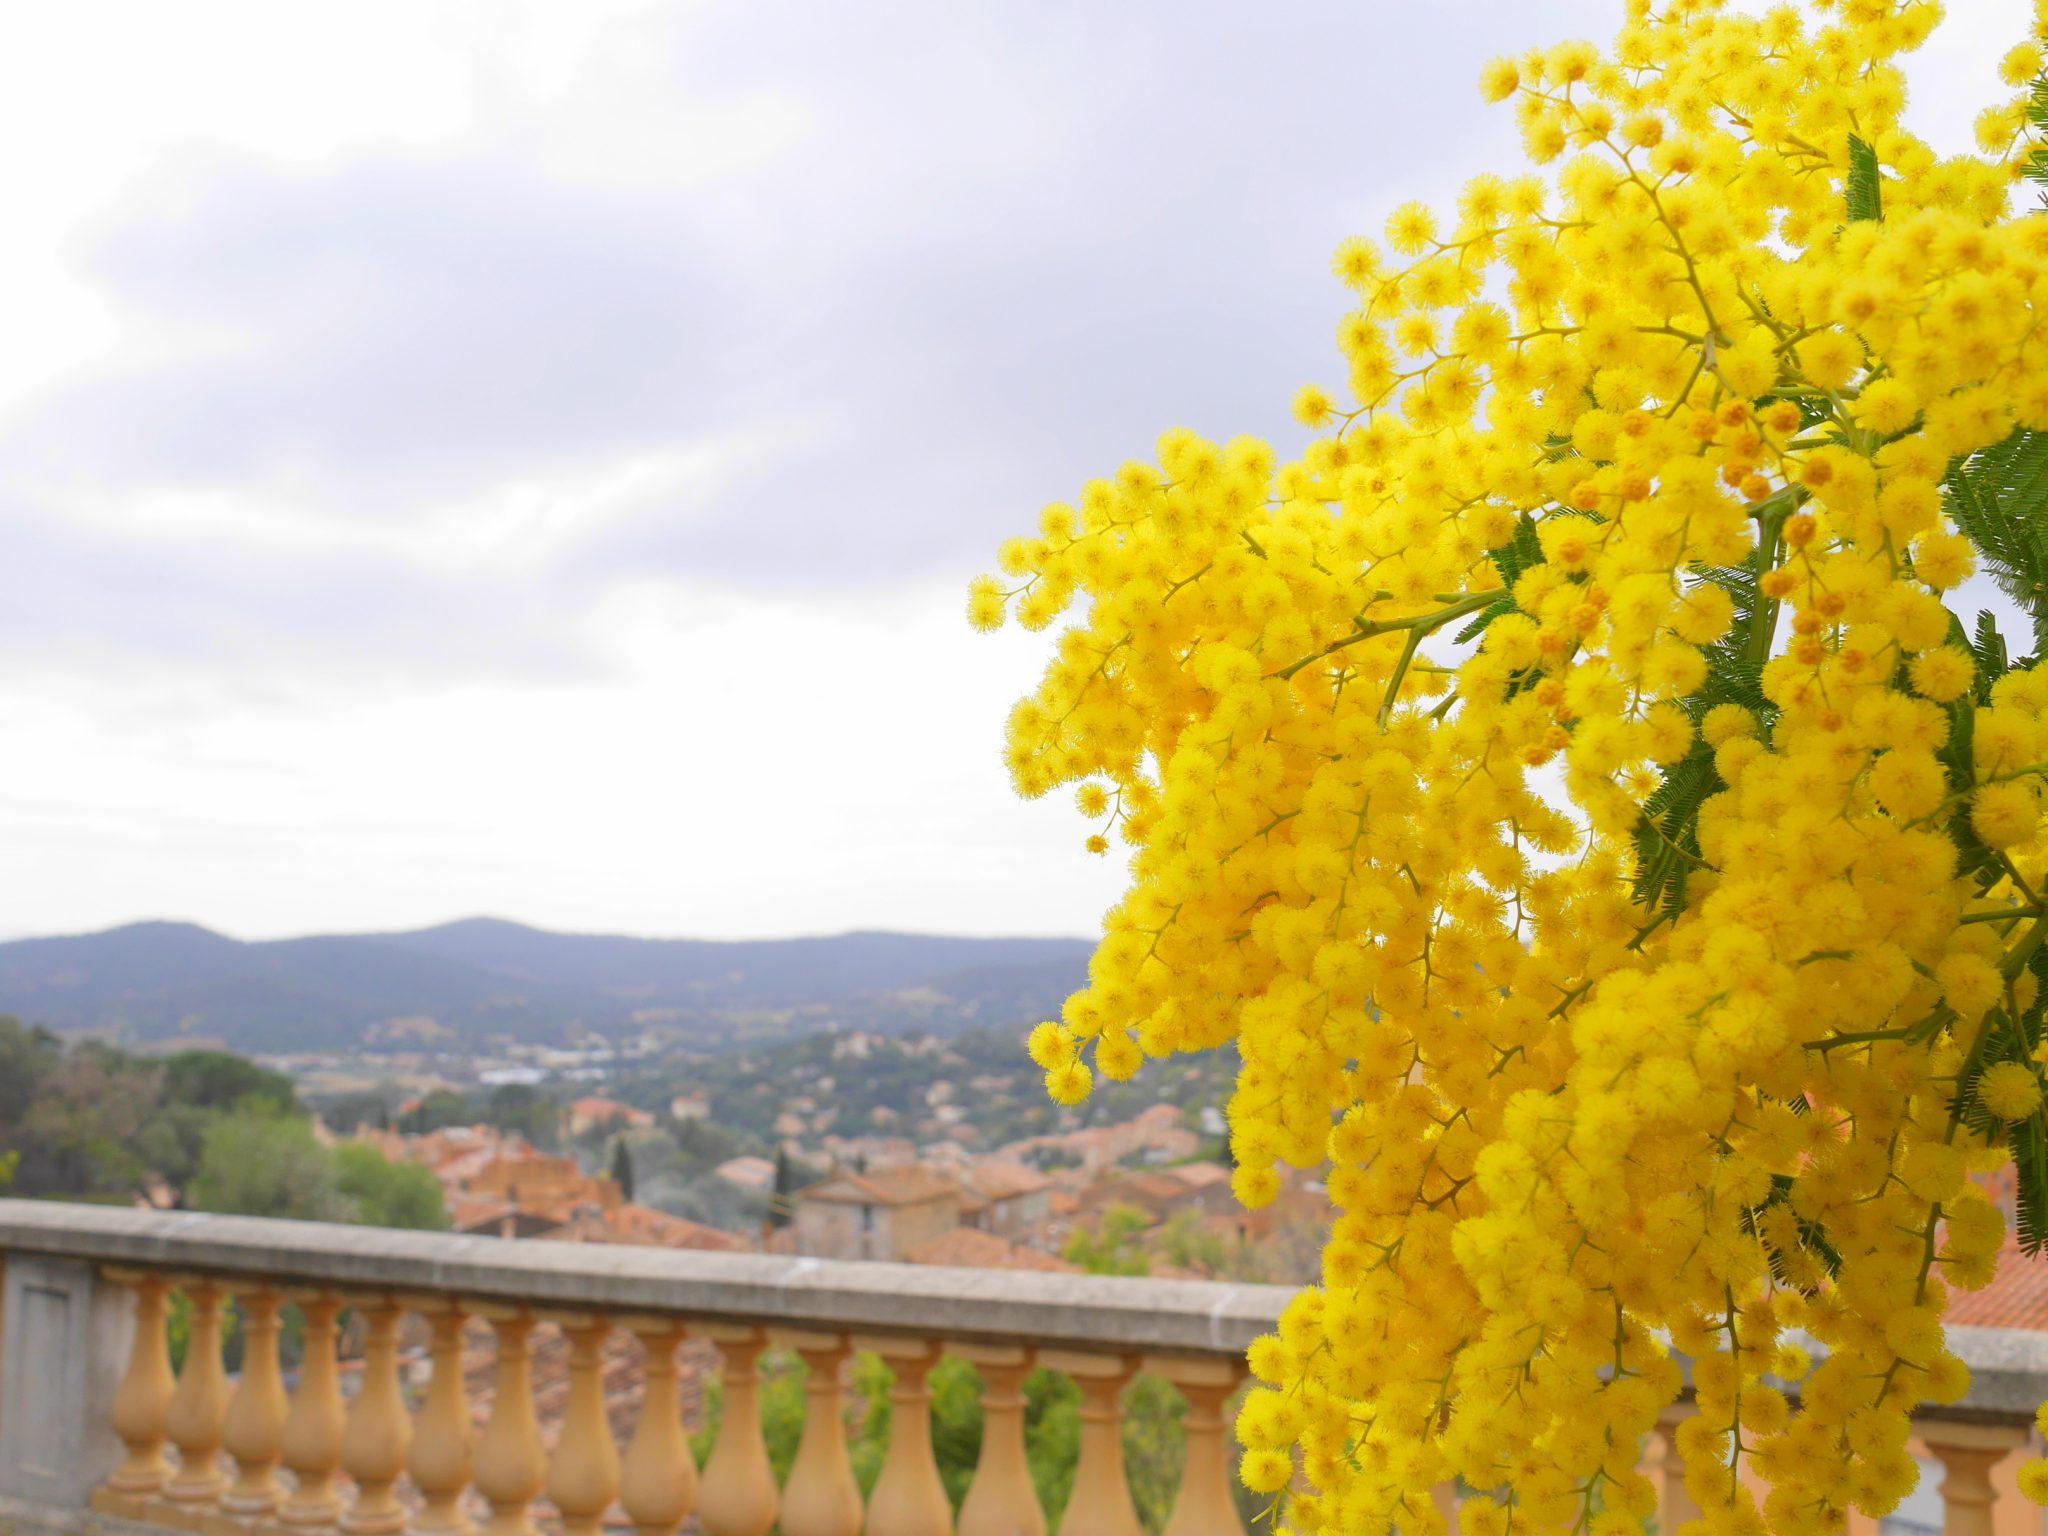 Bormes-les-mimosas